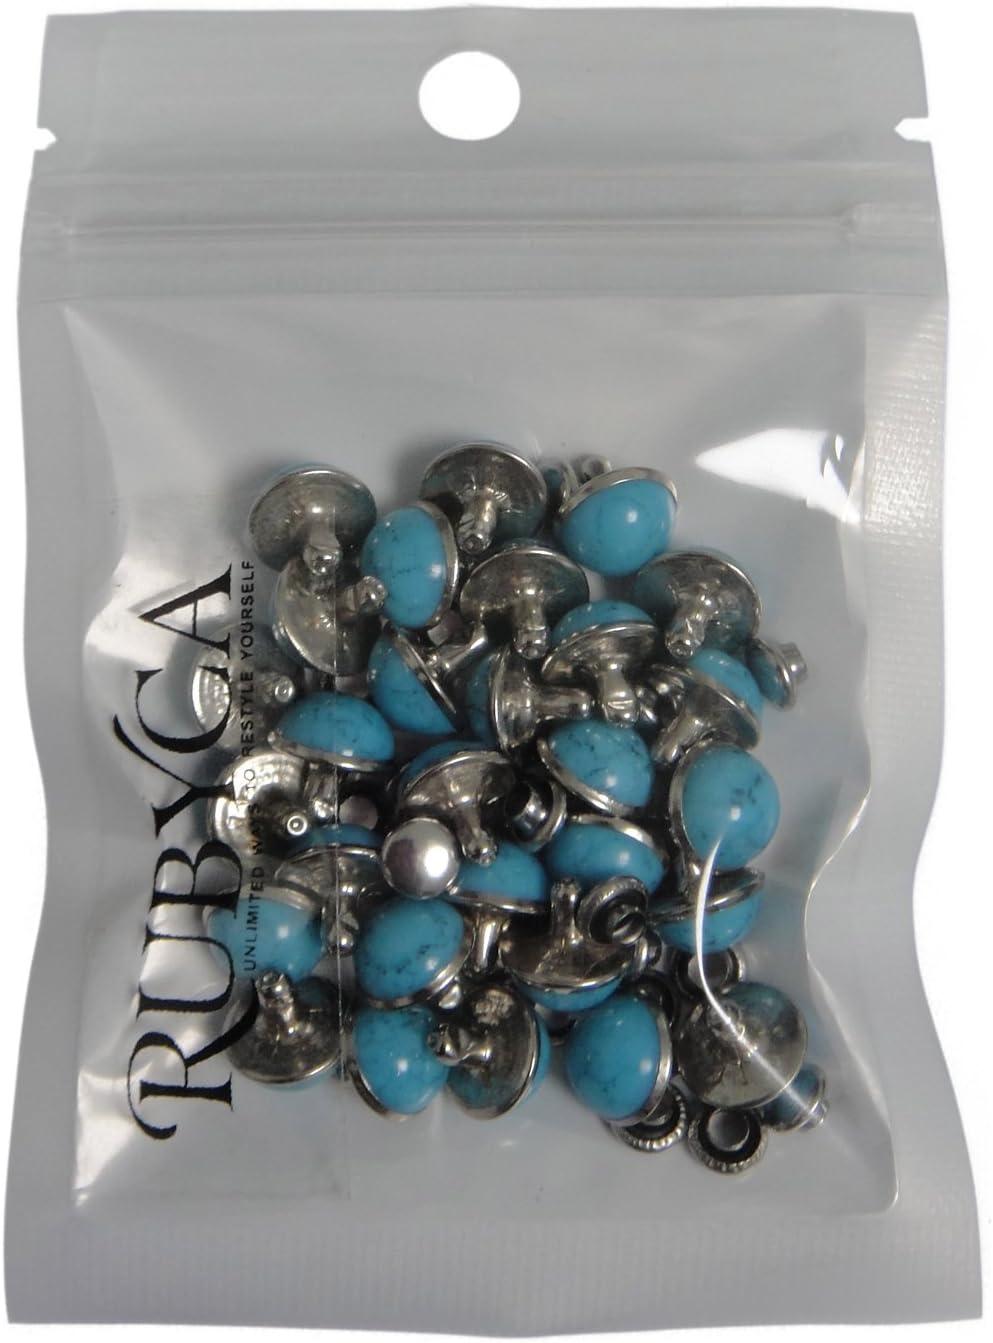 rubyca blau t/ürkis Rapid Nieten Nieten DIY leather-craft f/ür Tasche Schuhe Armband Tandy Leder